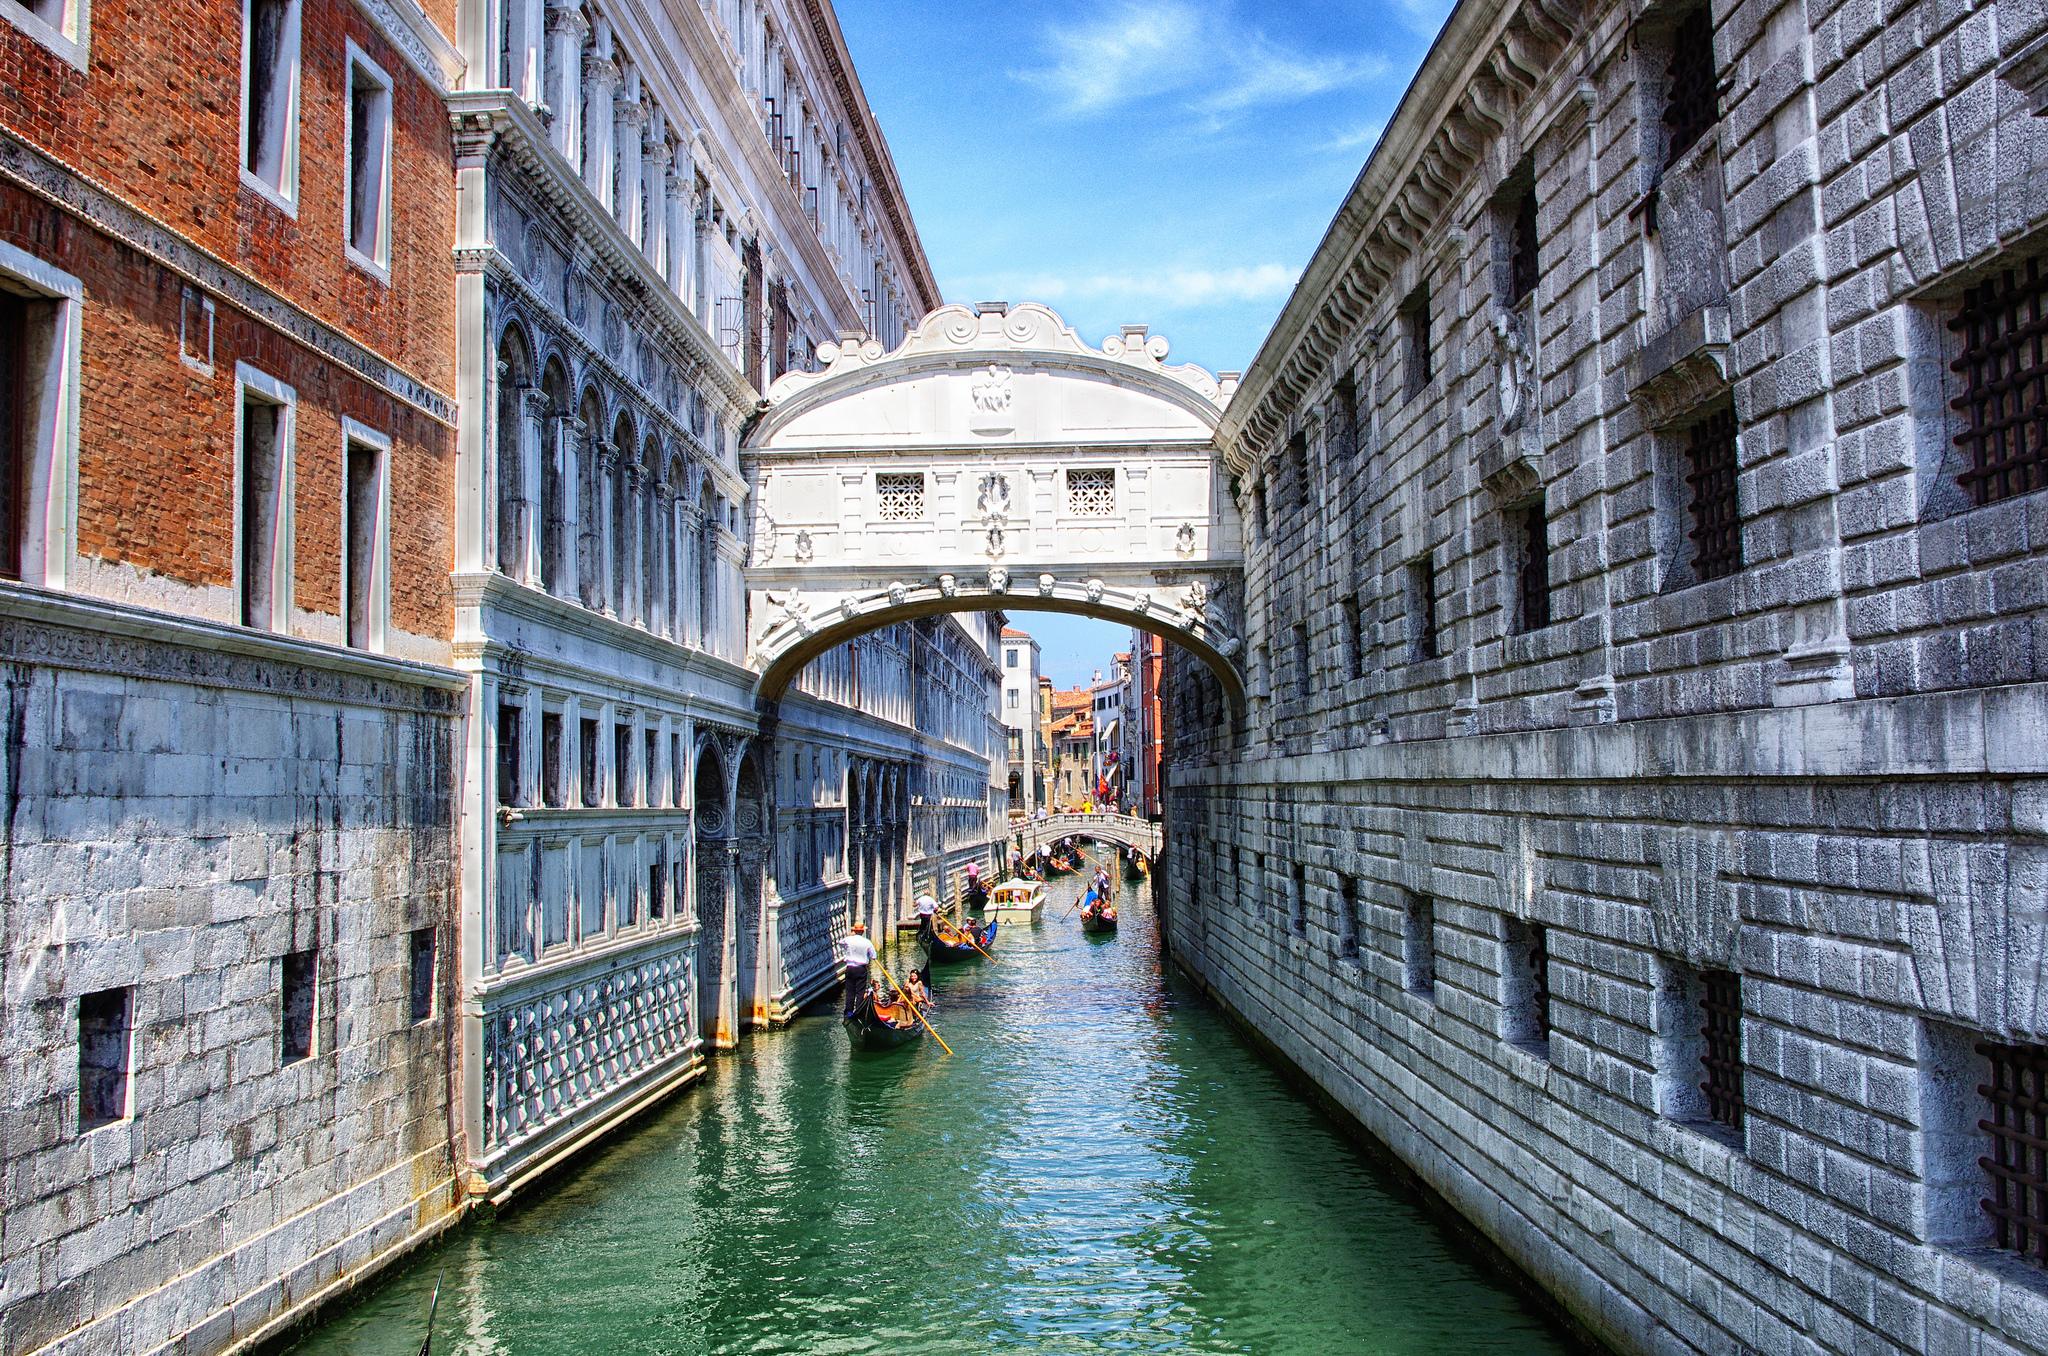 Italy Sighs Gondola.14325.jpg